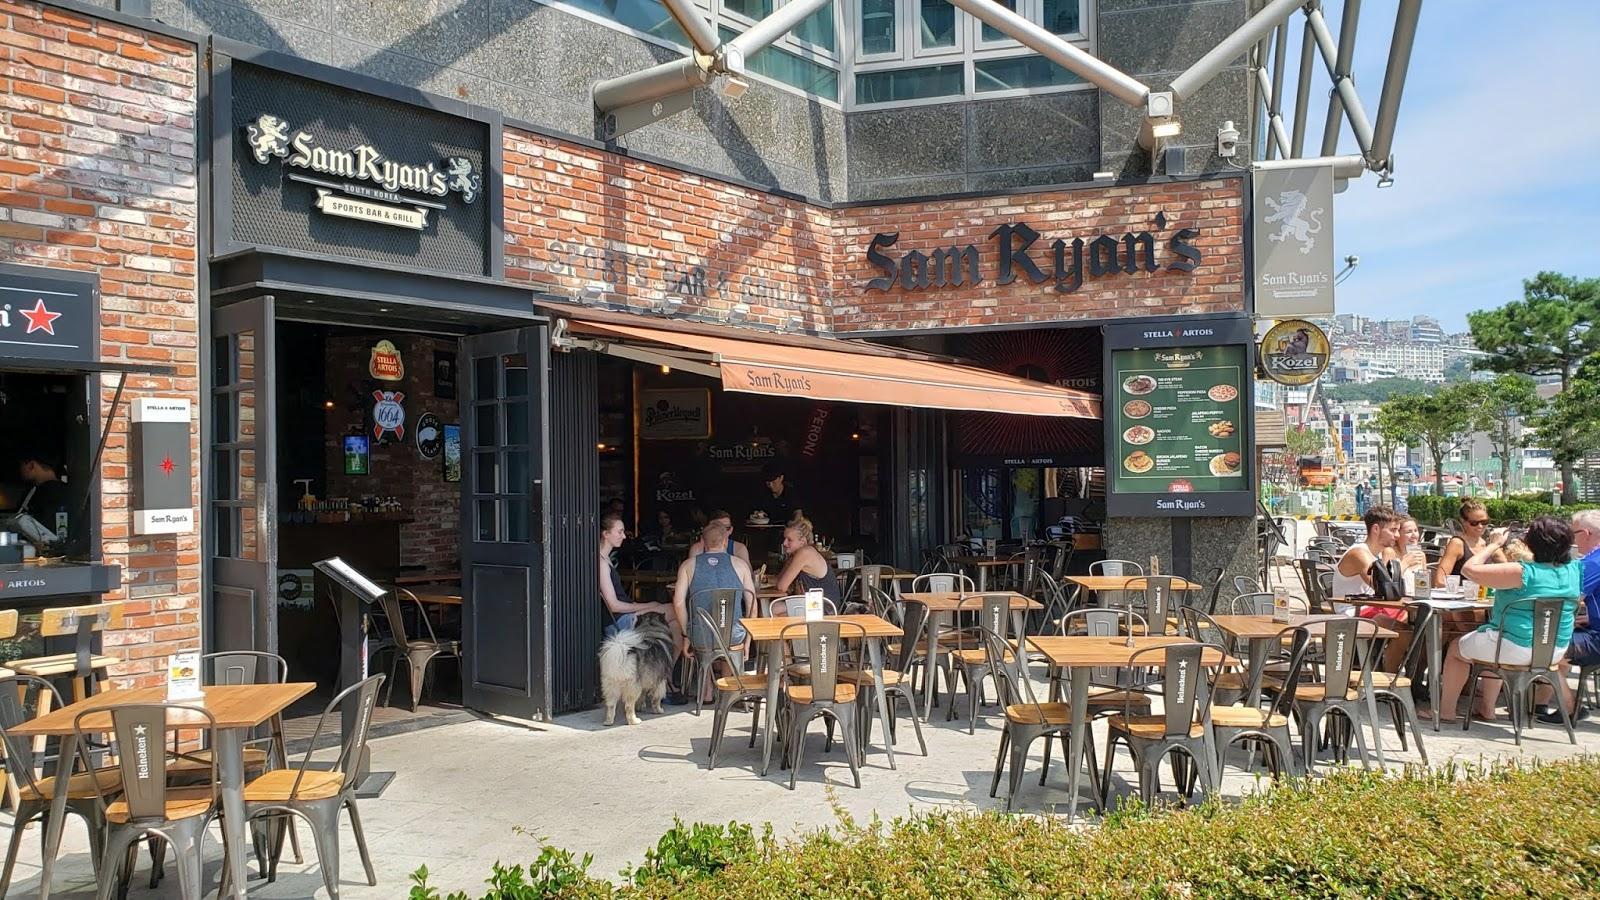 Jeeps Pubs Taverns And Bars Sam Ryan S Sports Bar Grill